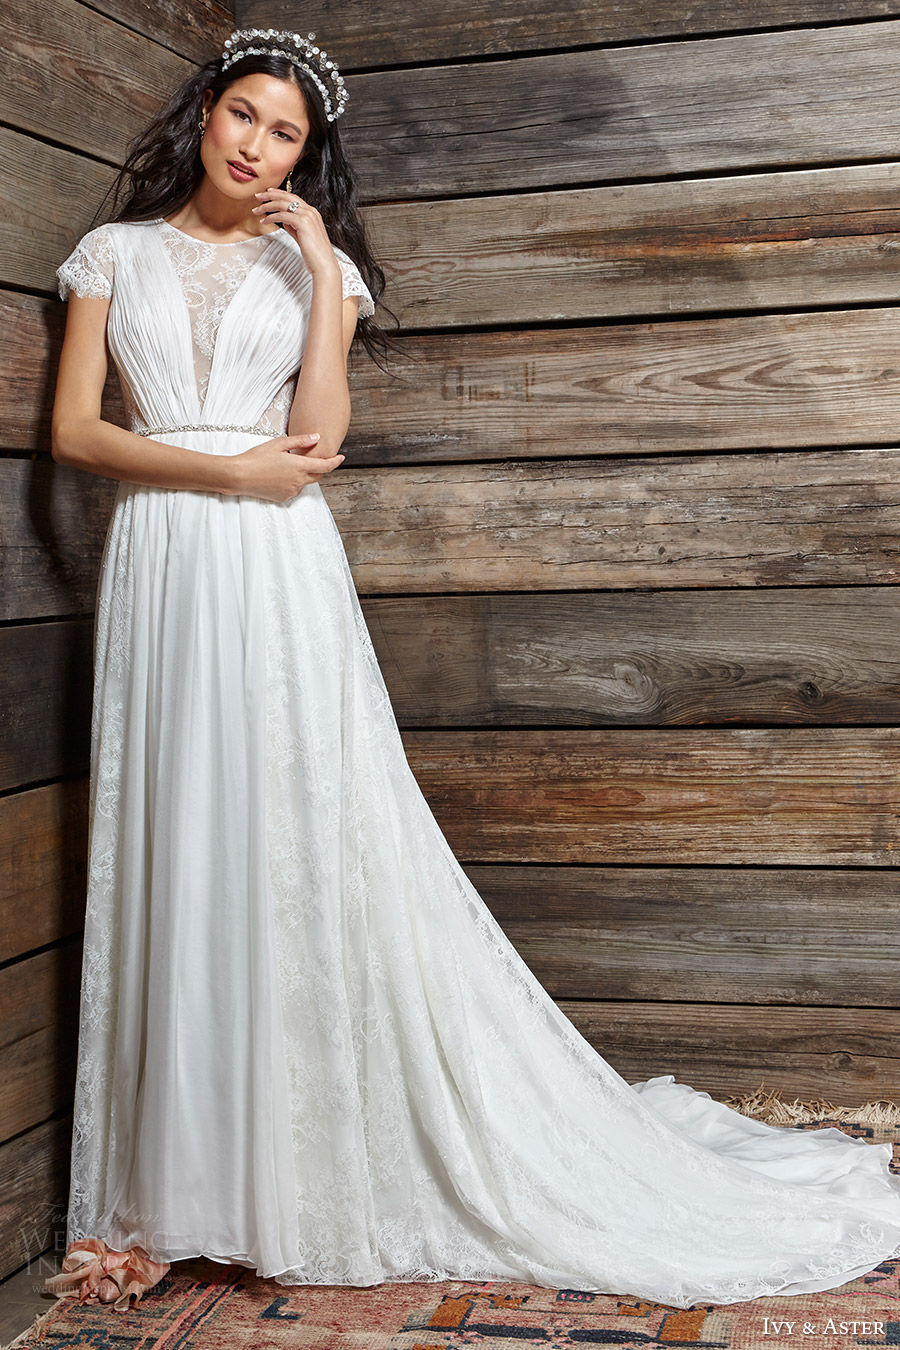 ivy aster bridal spring 2017 cap sleeves illusion jewel neck aline wedding dress (clementine) mv